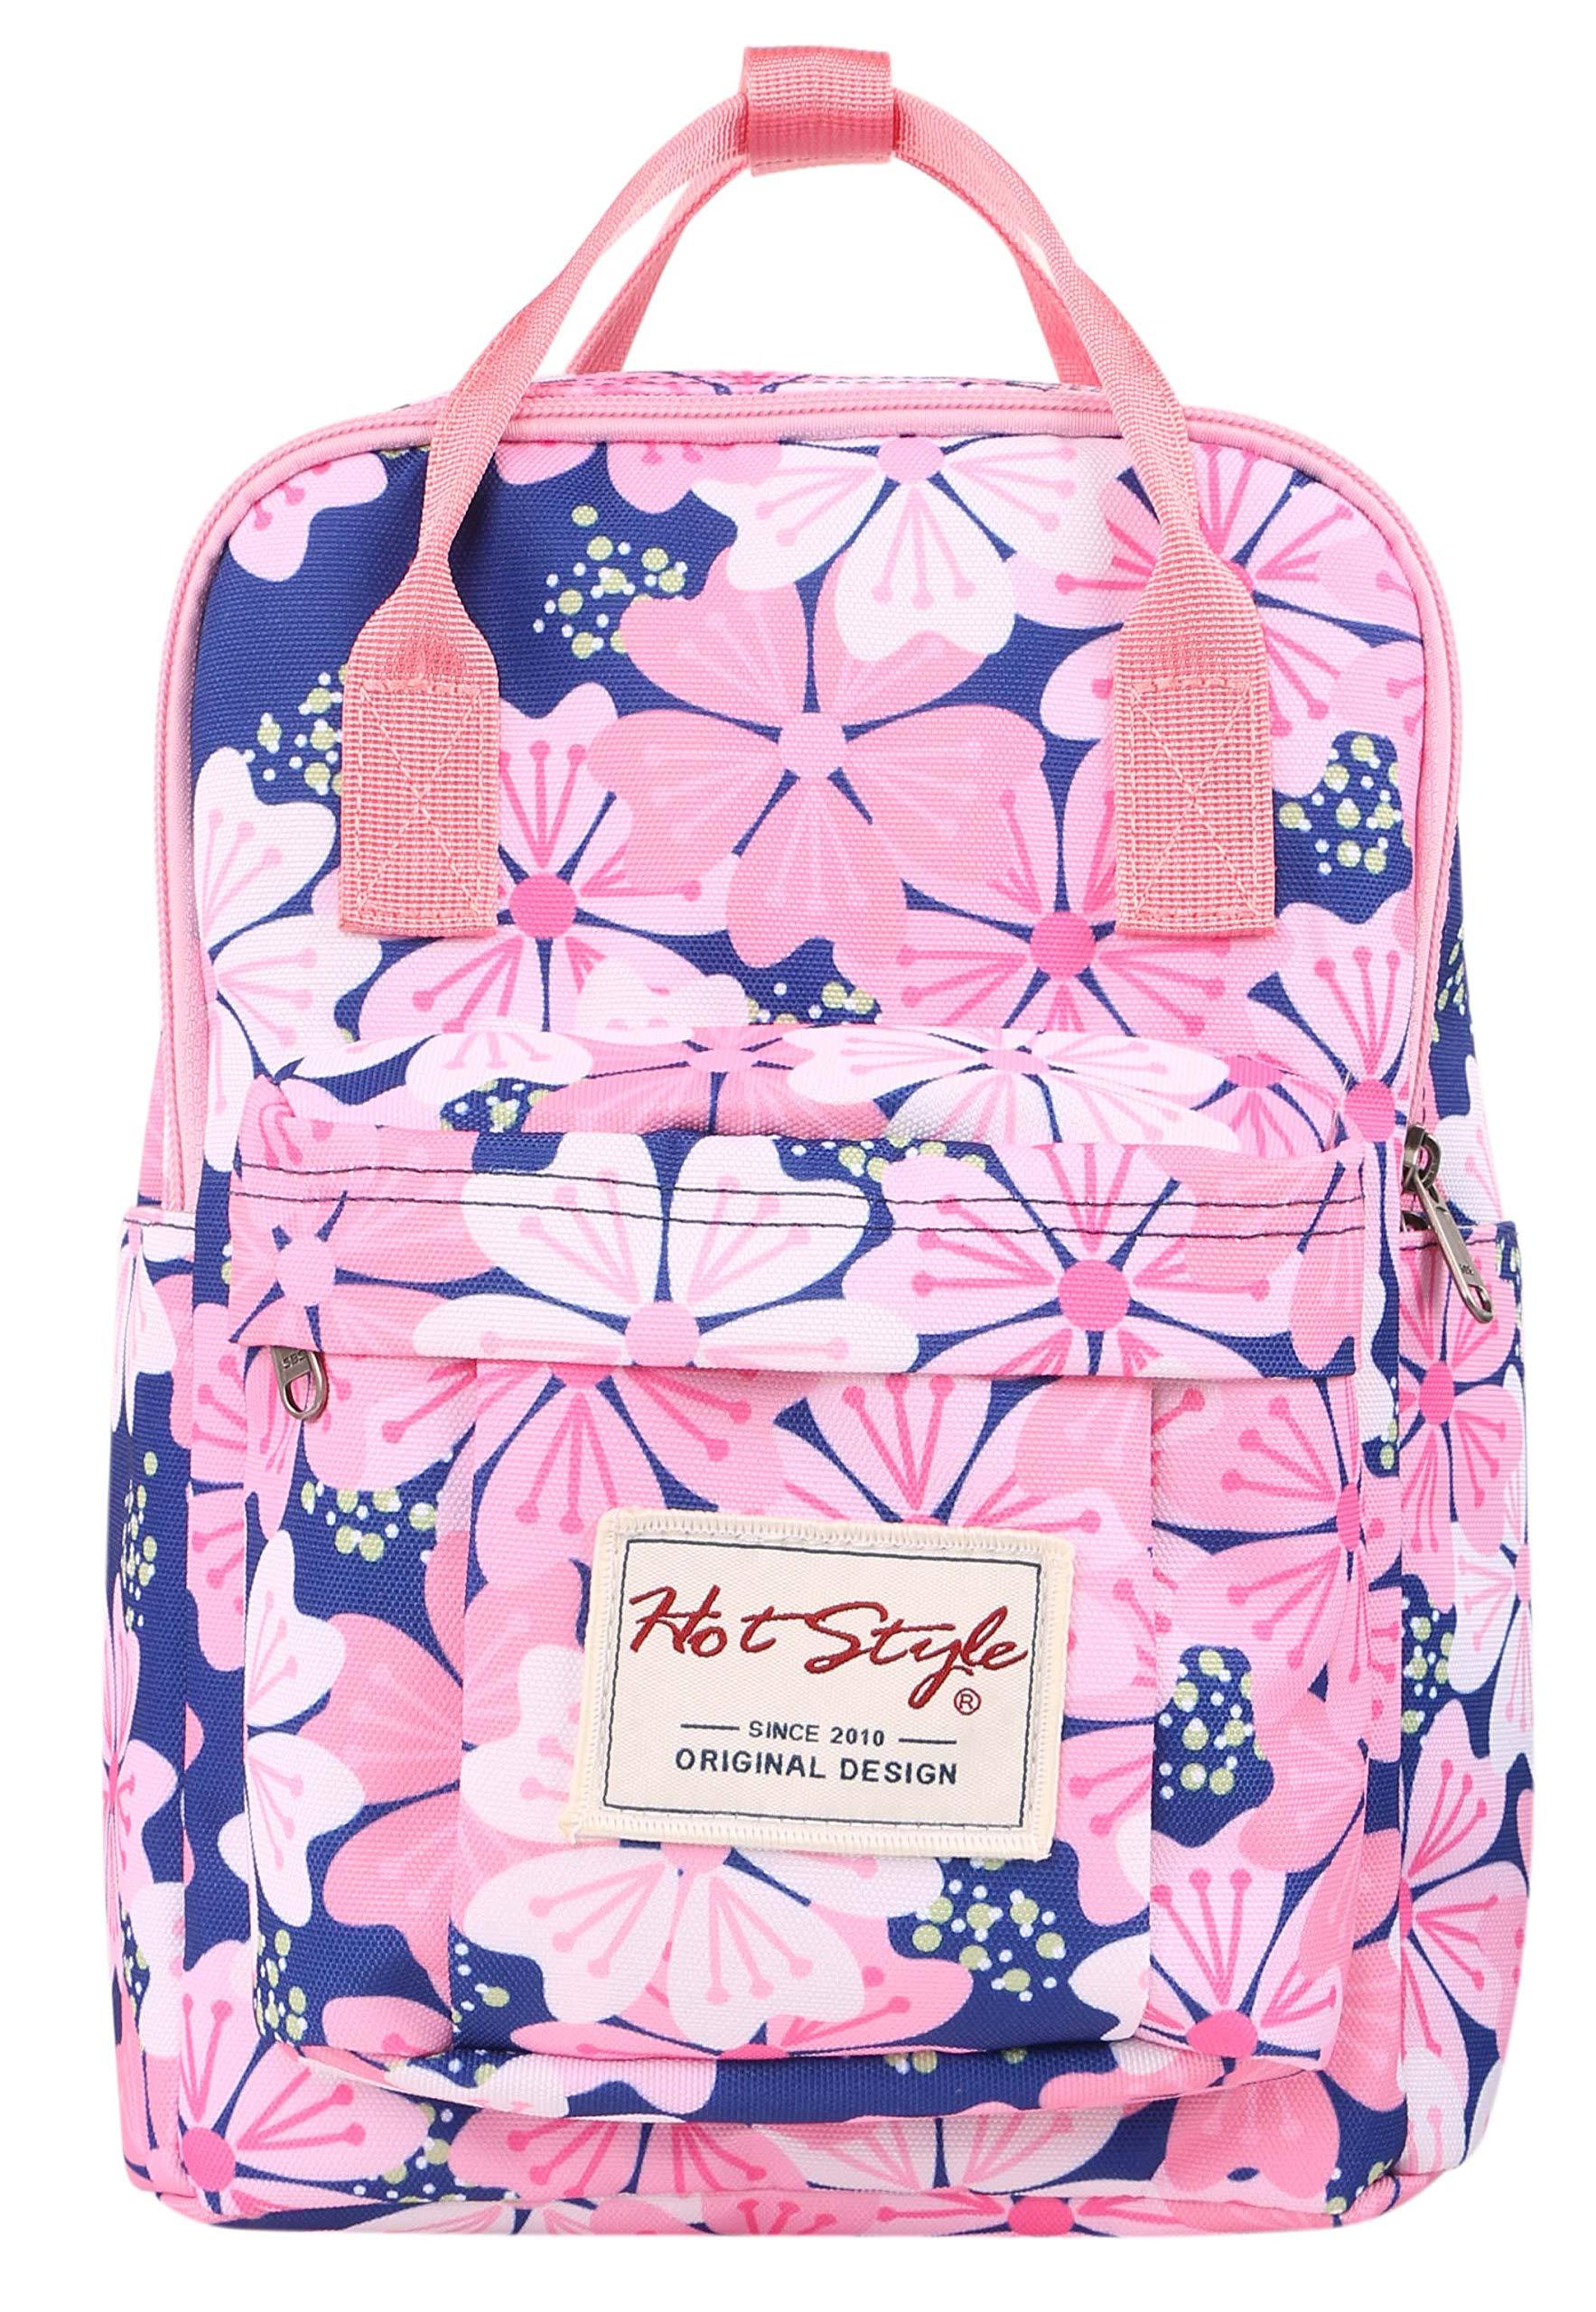 BESTIE 12'' Cute Mini Backpack Purse Travel Bag, Floral Pink